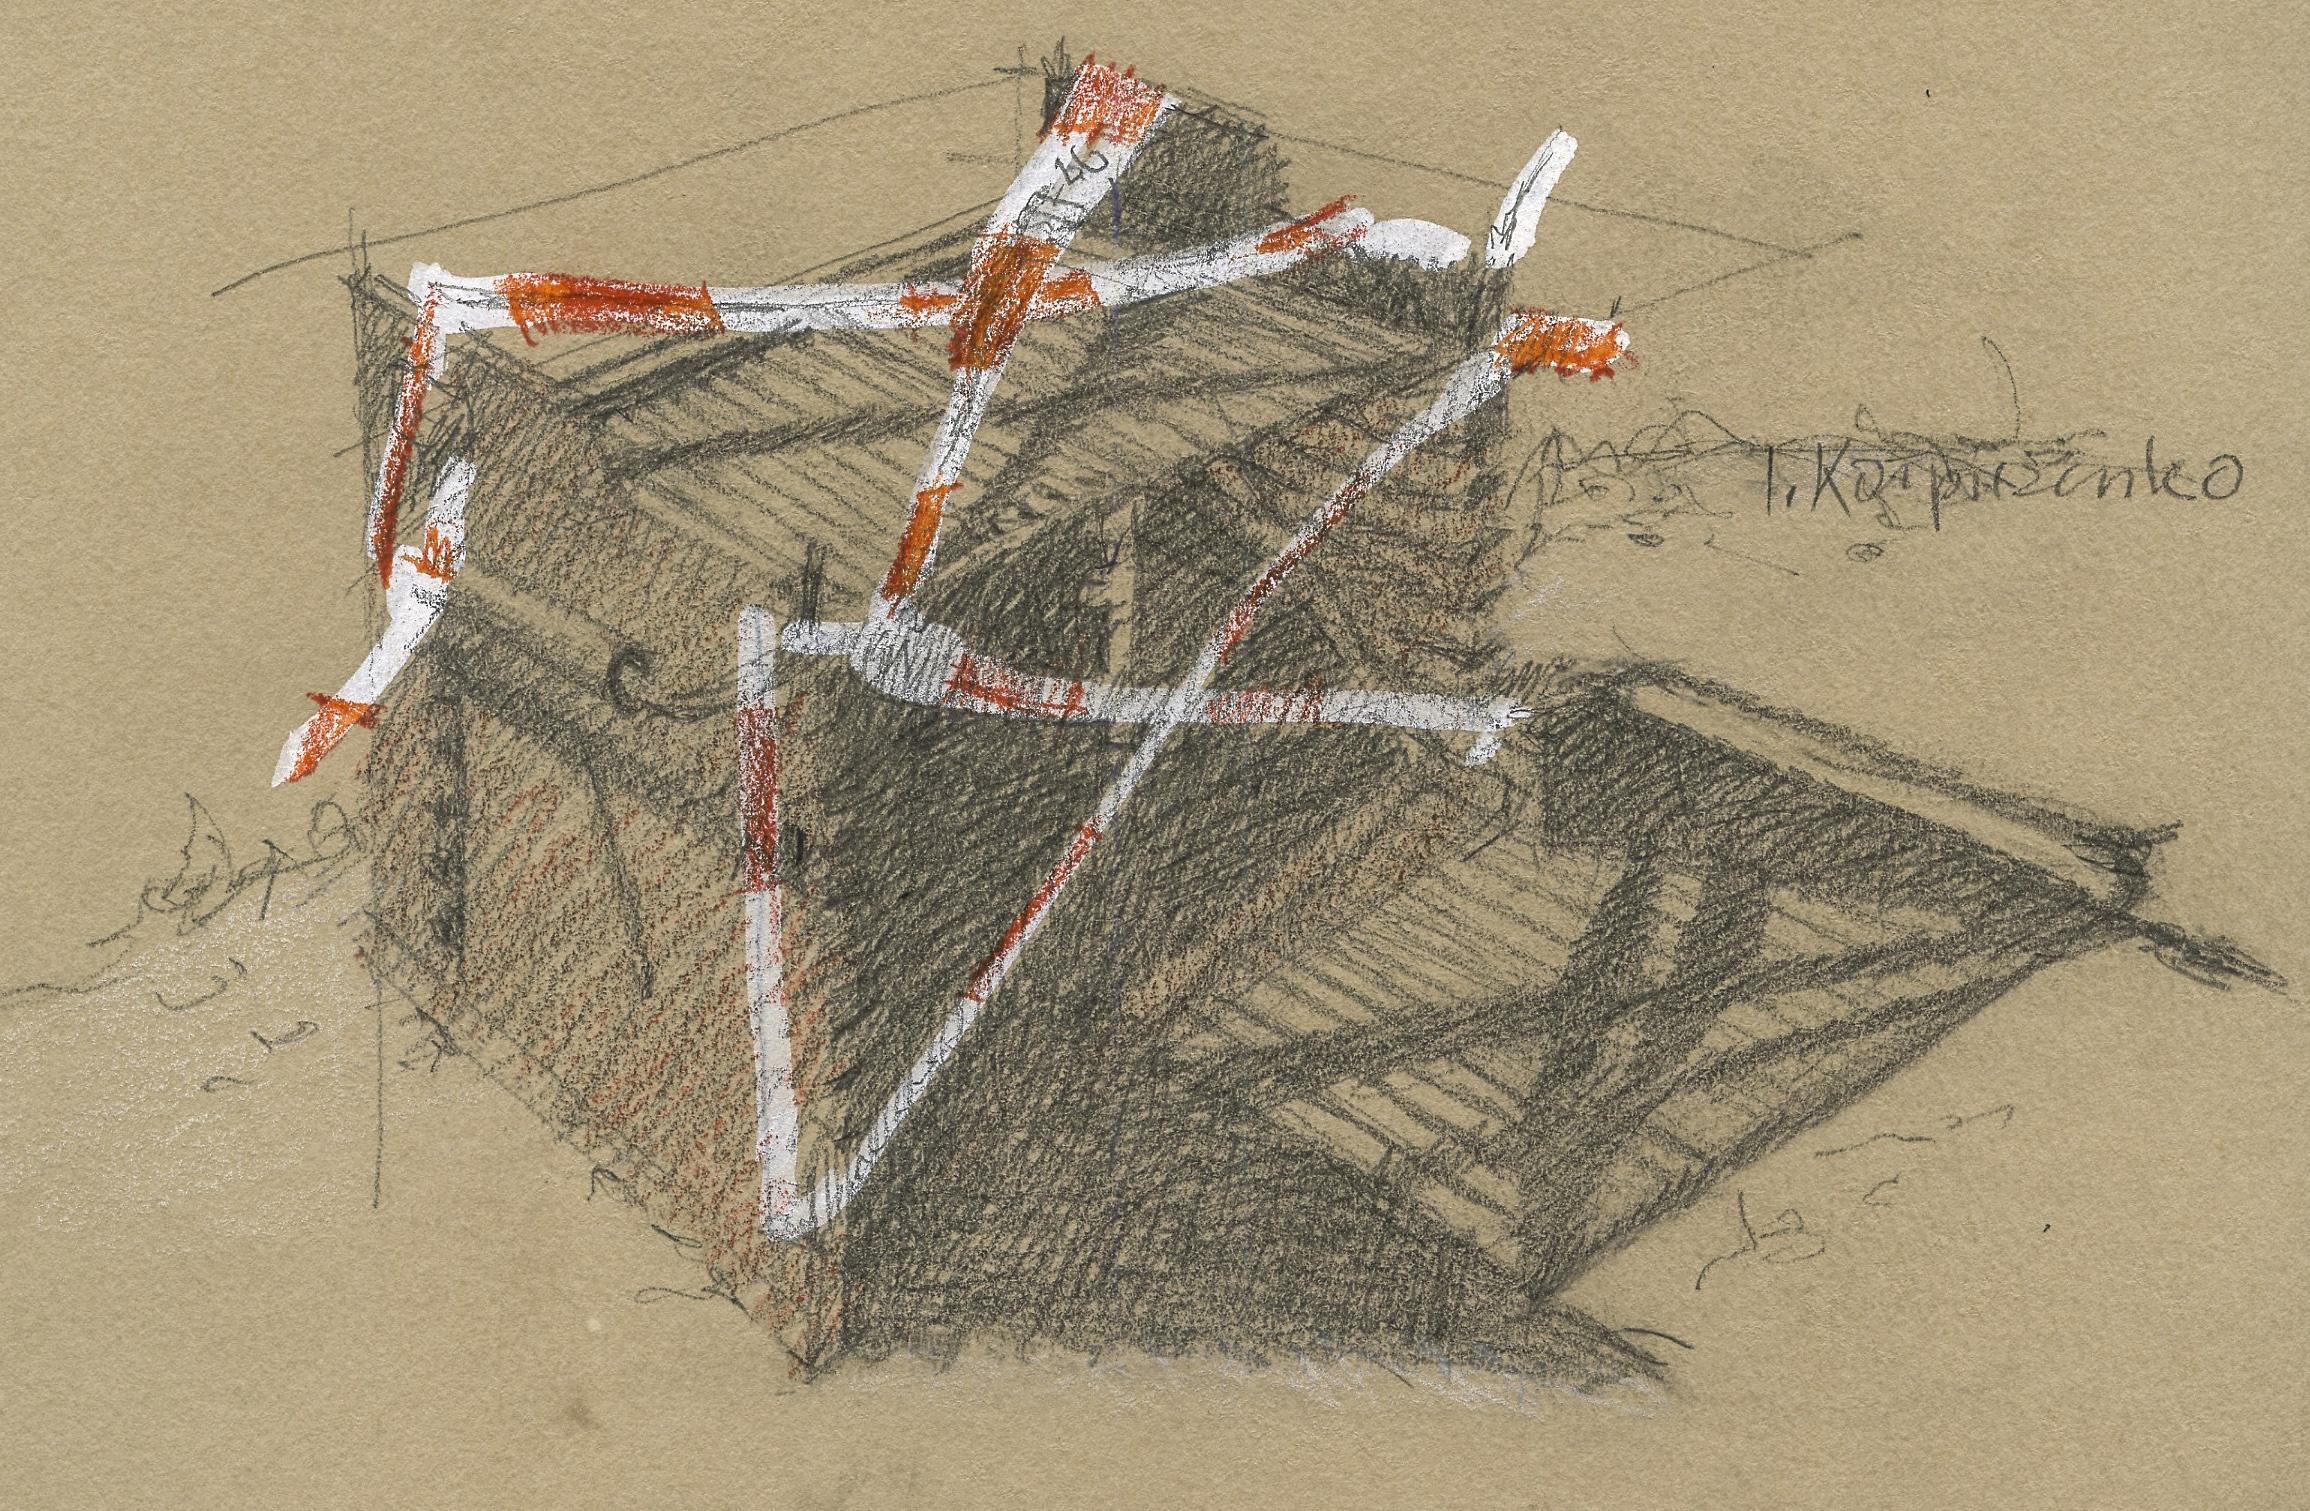 Bleistiftskizze der Bollwaldhütte, wegen Corona abgesperrt mit einem rot-weissen Band.